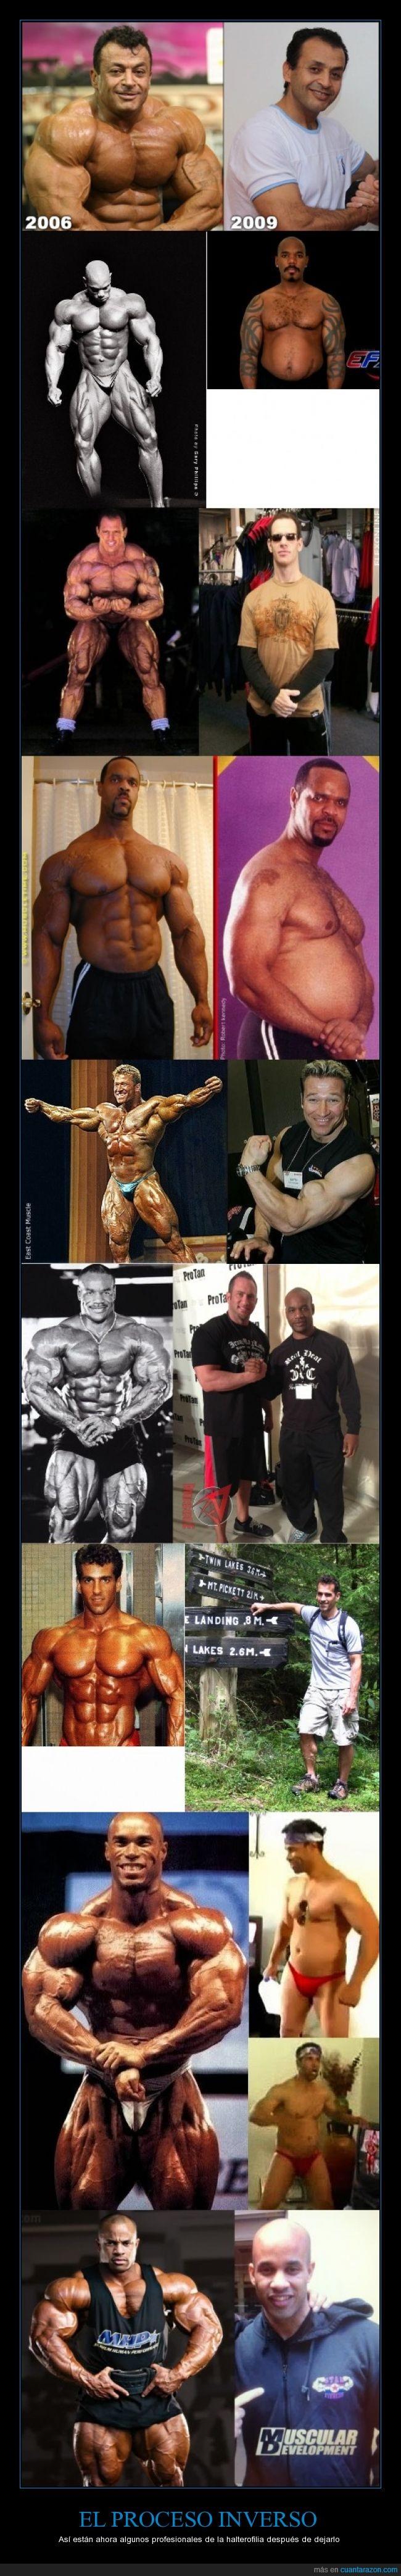 atleta,brazos,cachas,culturismo,culturista,fisicoculturismo,fisicoculturista,fuete,halterofilia,son ciclos sanos